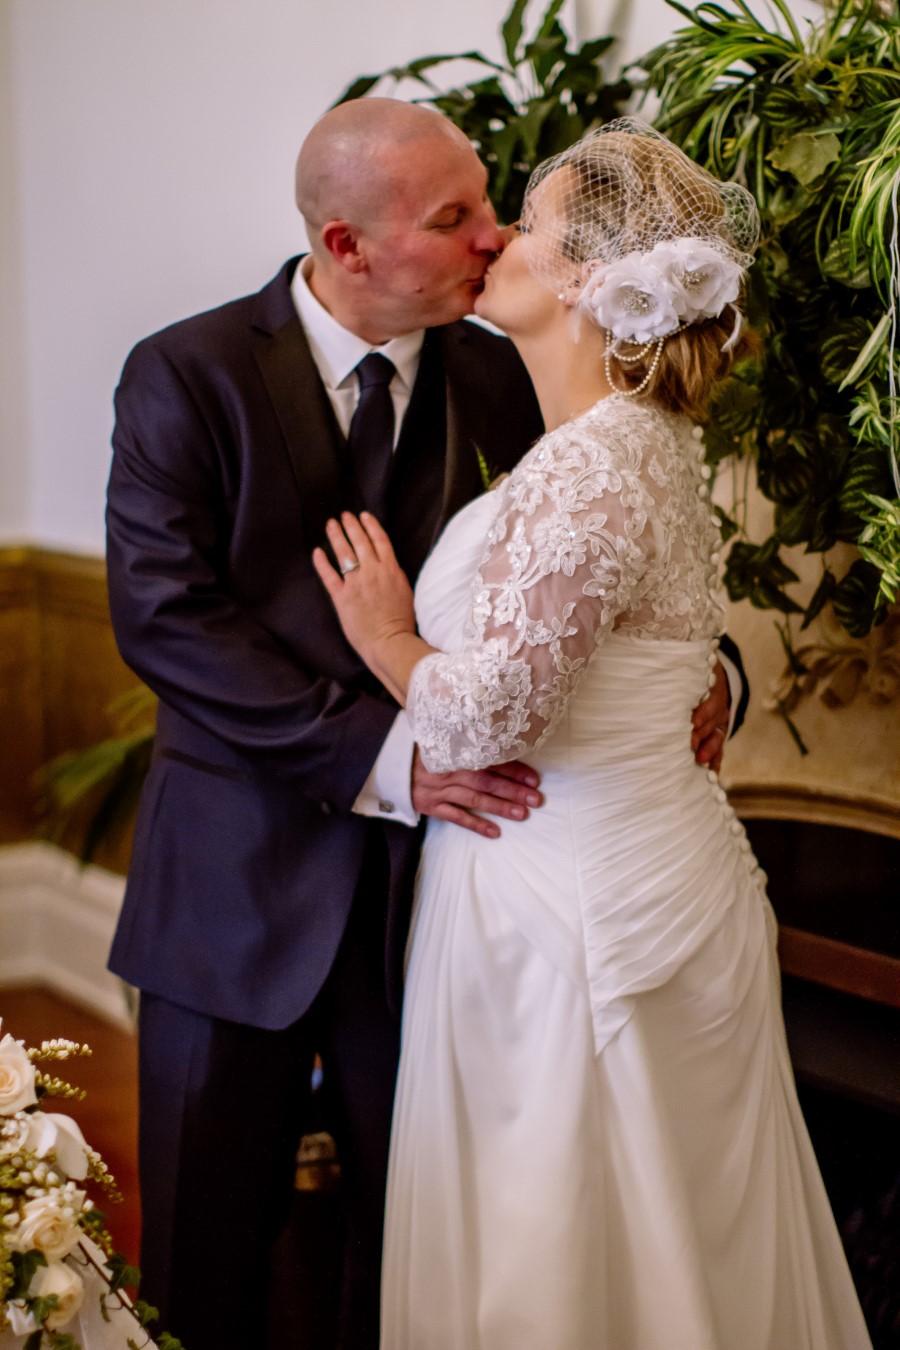 nz_wedding_st_leonards_mchughs-678